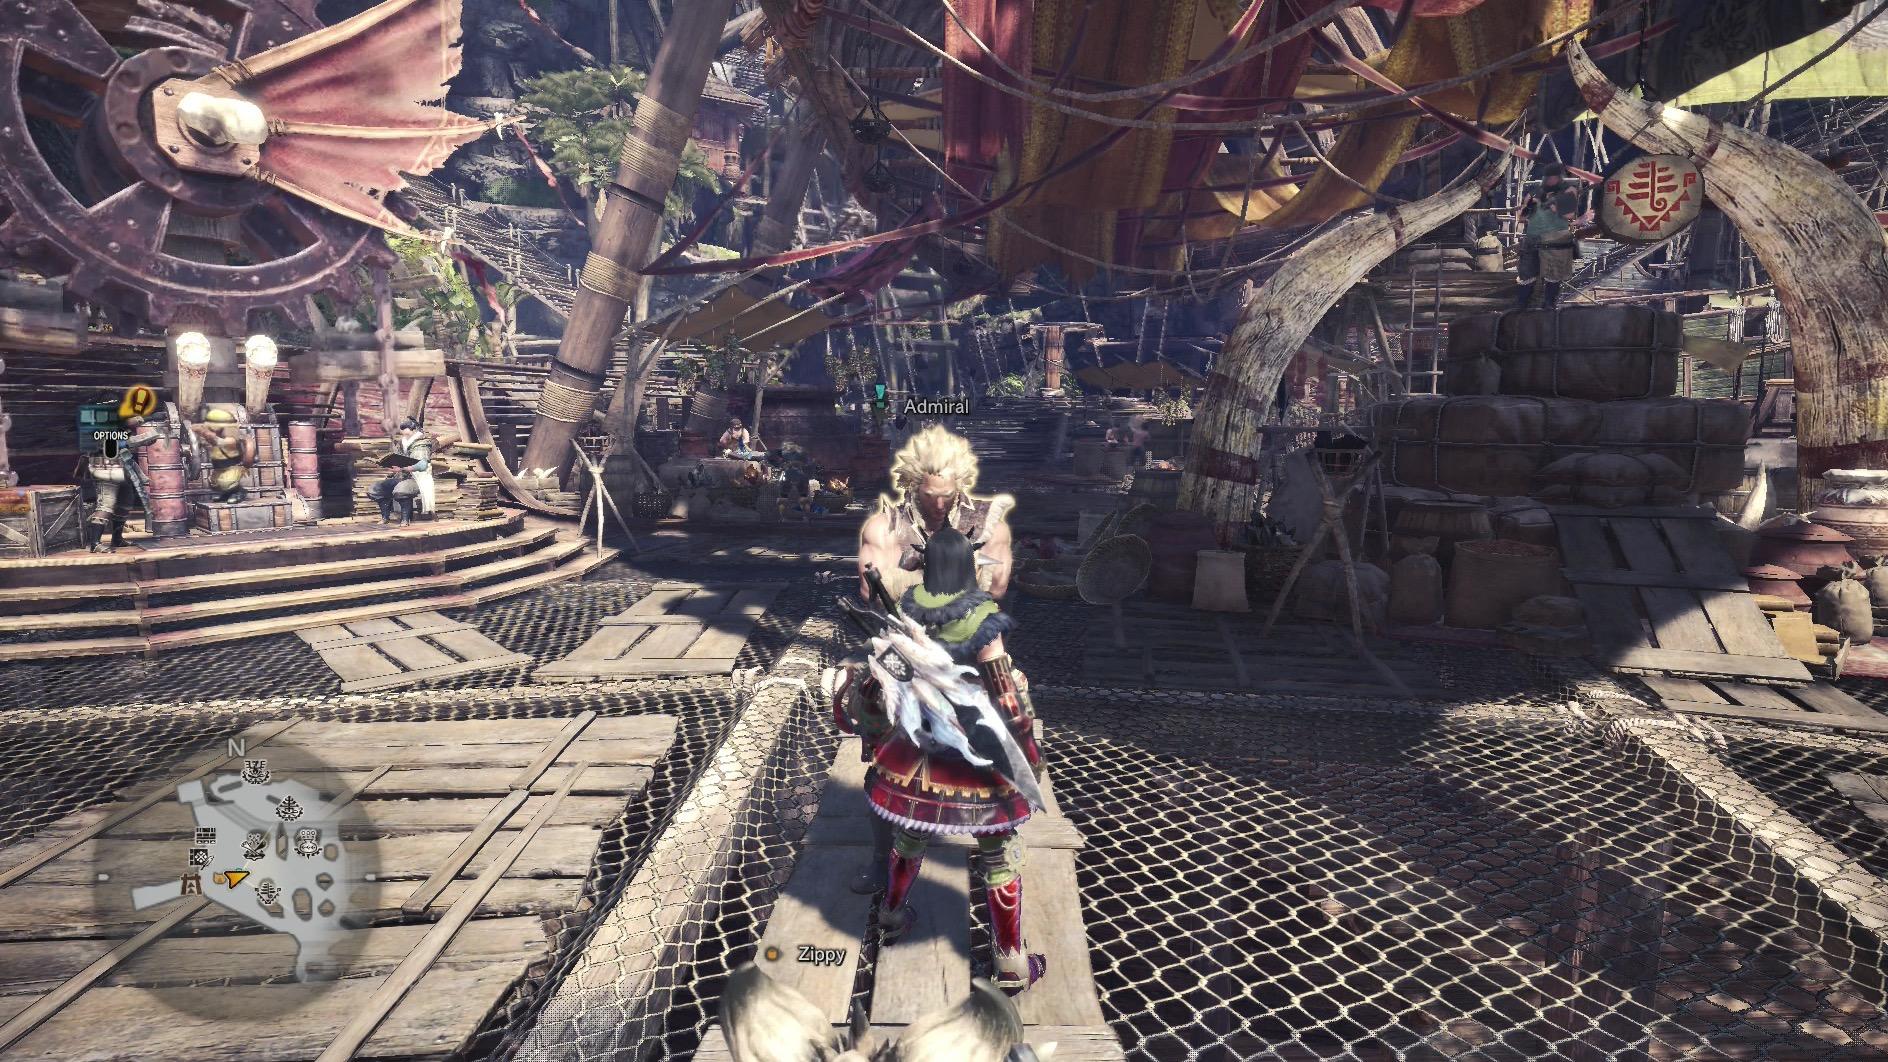 Monster Hunter: World - How to Start the Kulve Taroth Siege, Rewards